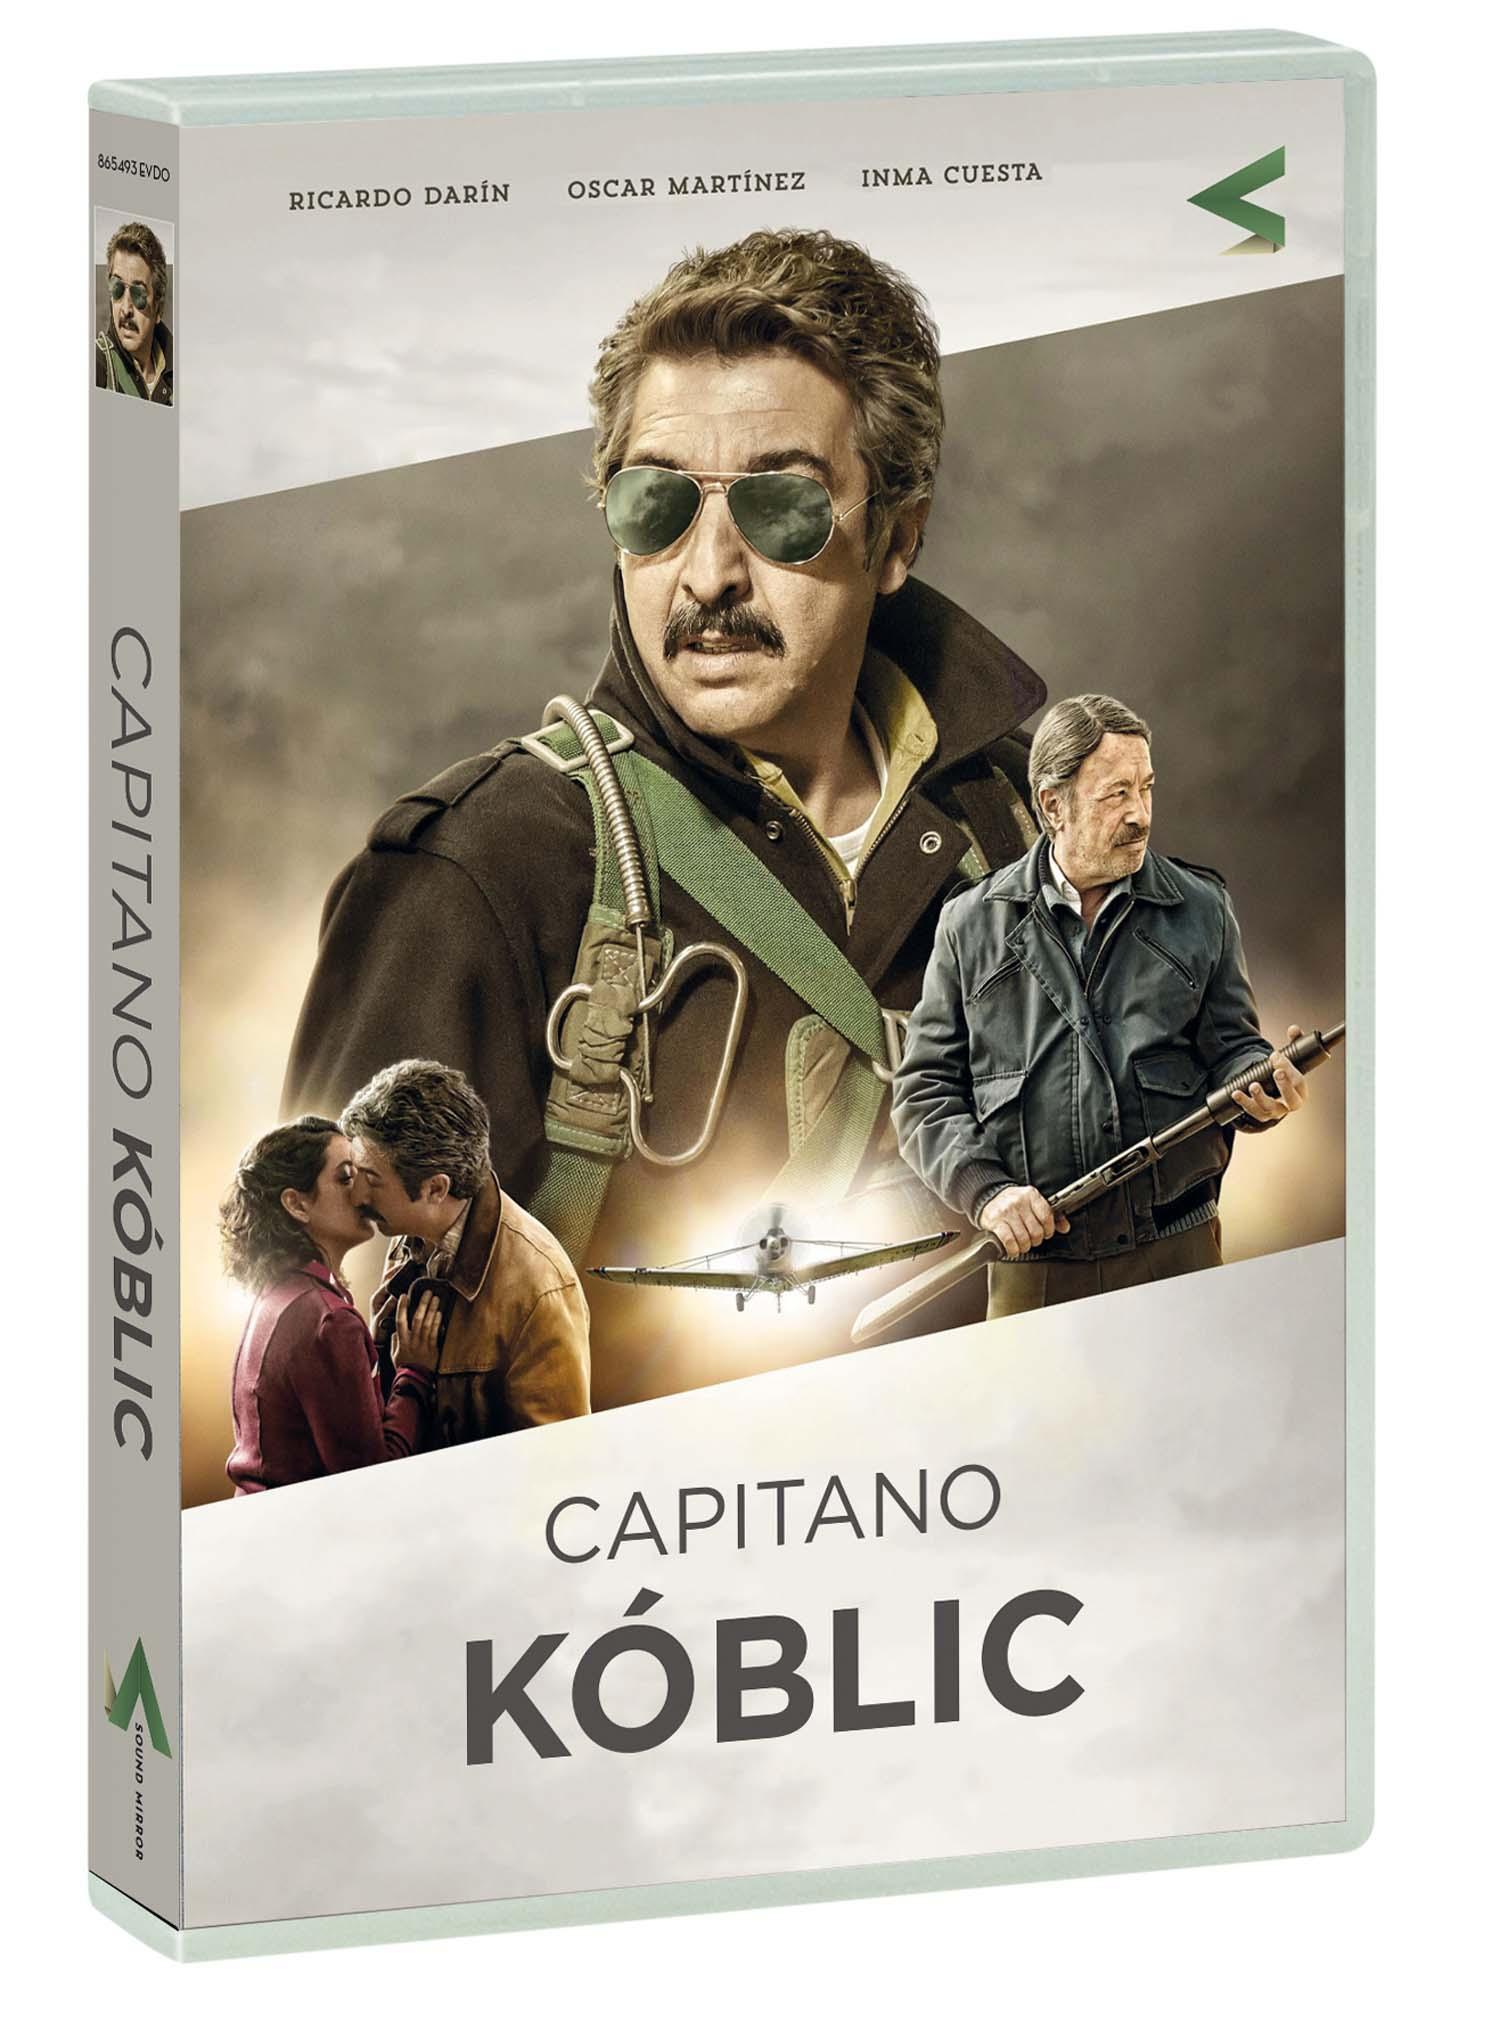 CAPITANO KOBLIC (DVD)